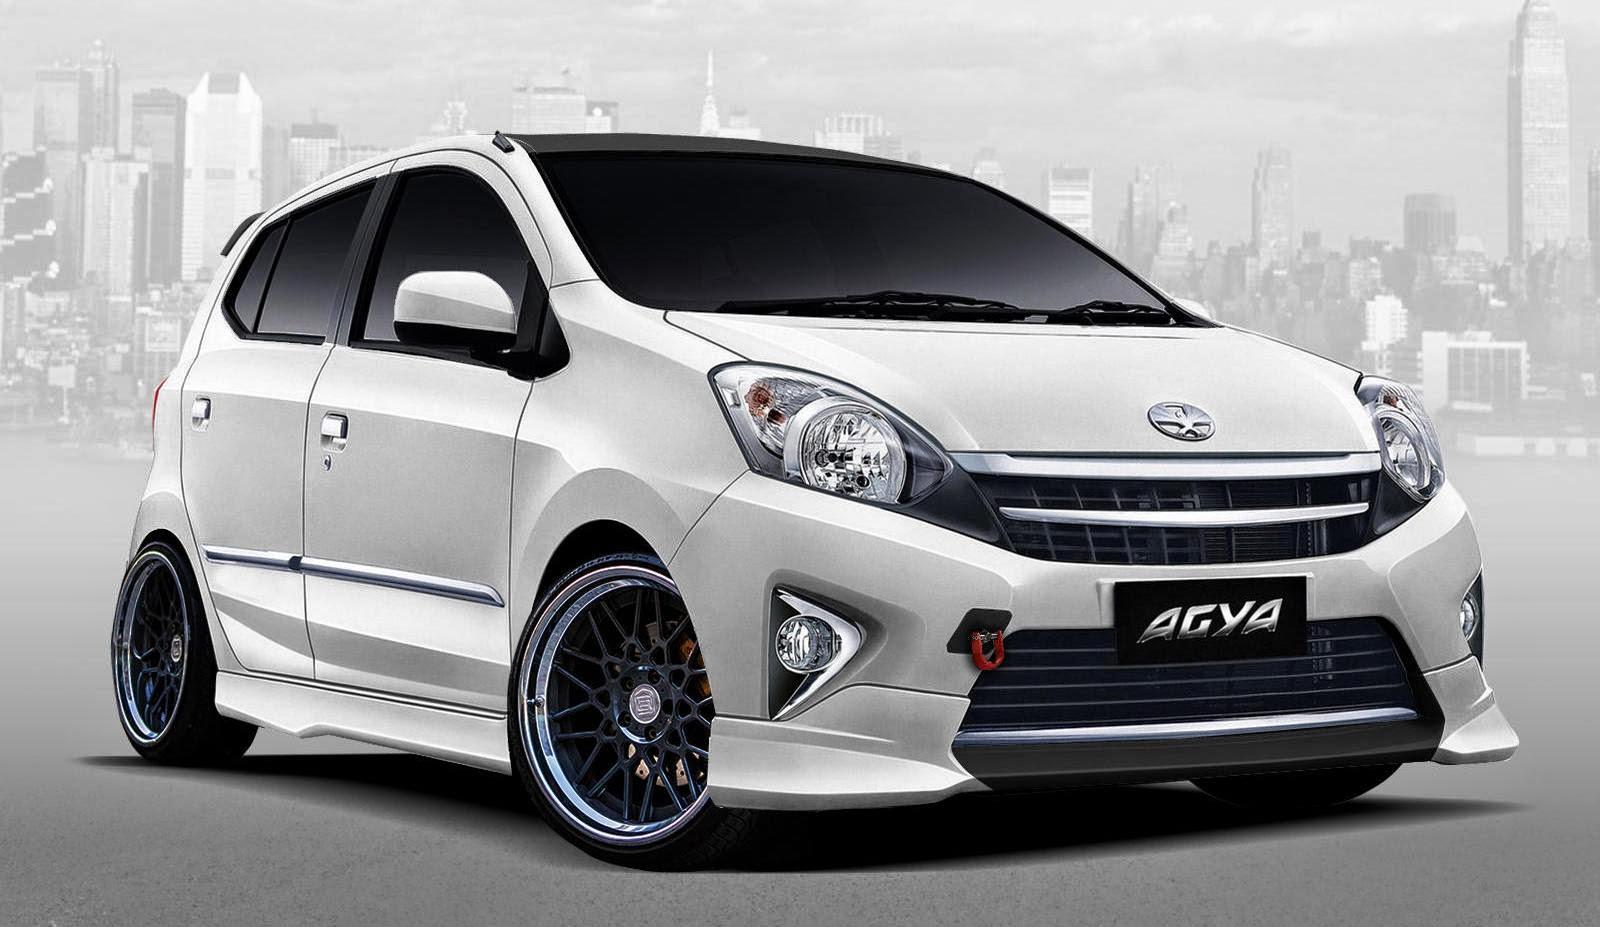 Harga New Agya Trd Grand Avanza Veloz 2015 Spesifikasi Toyota